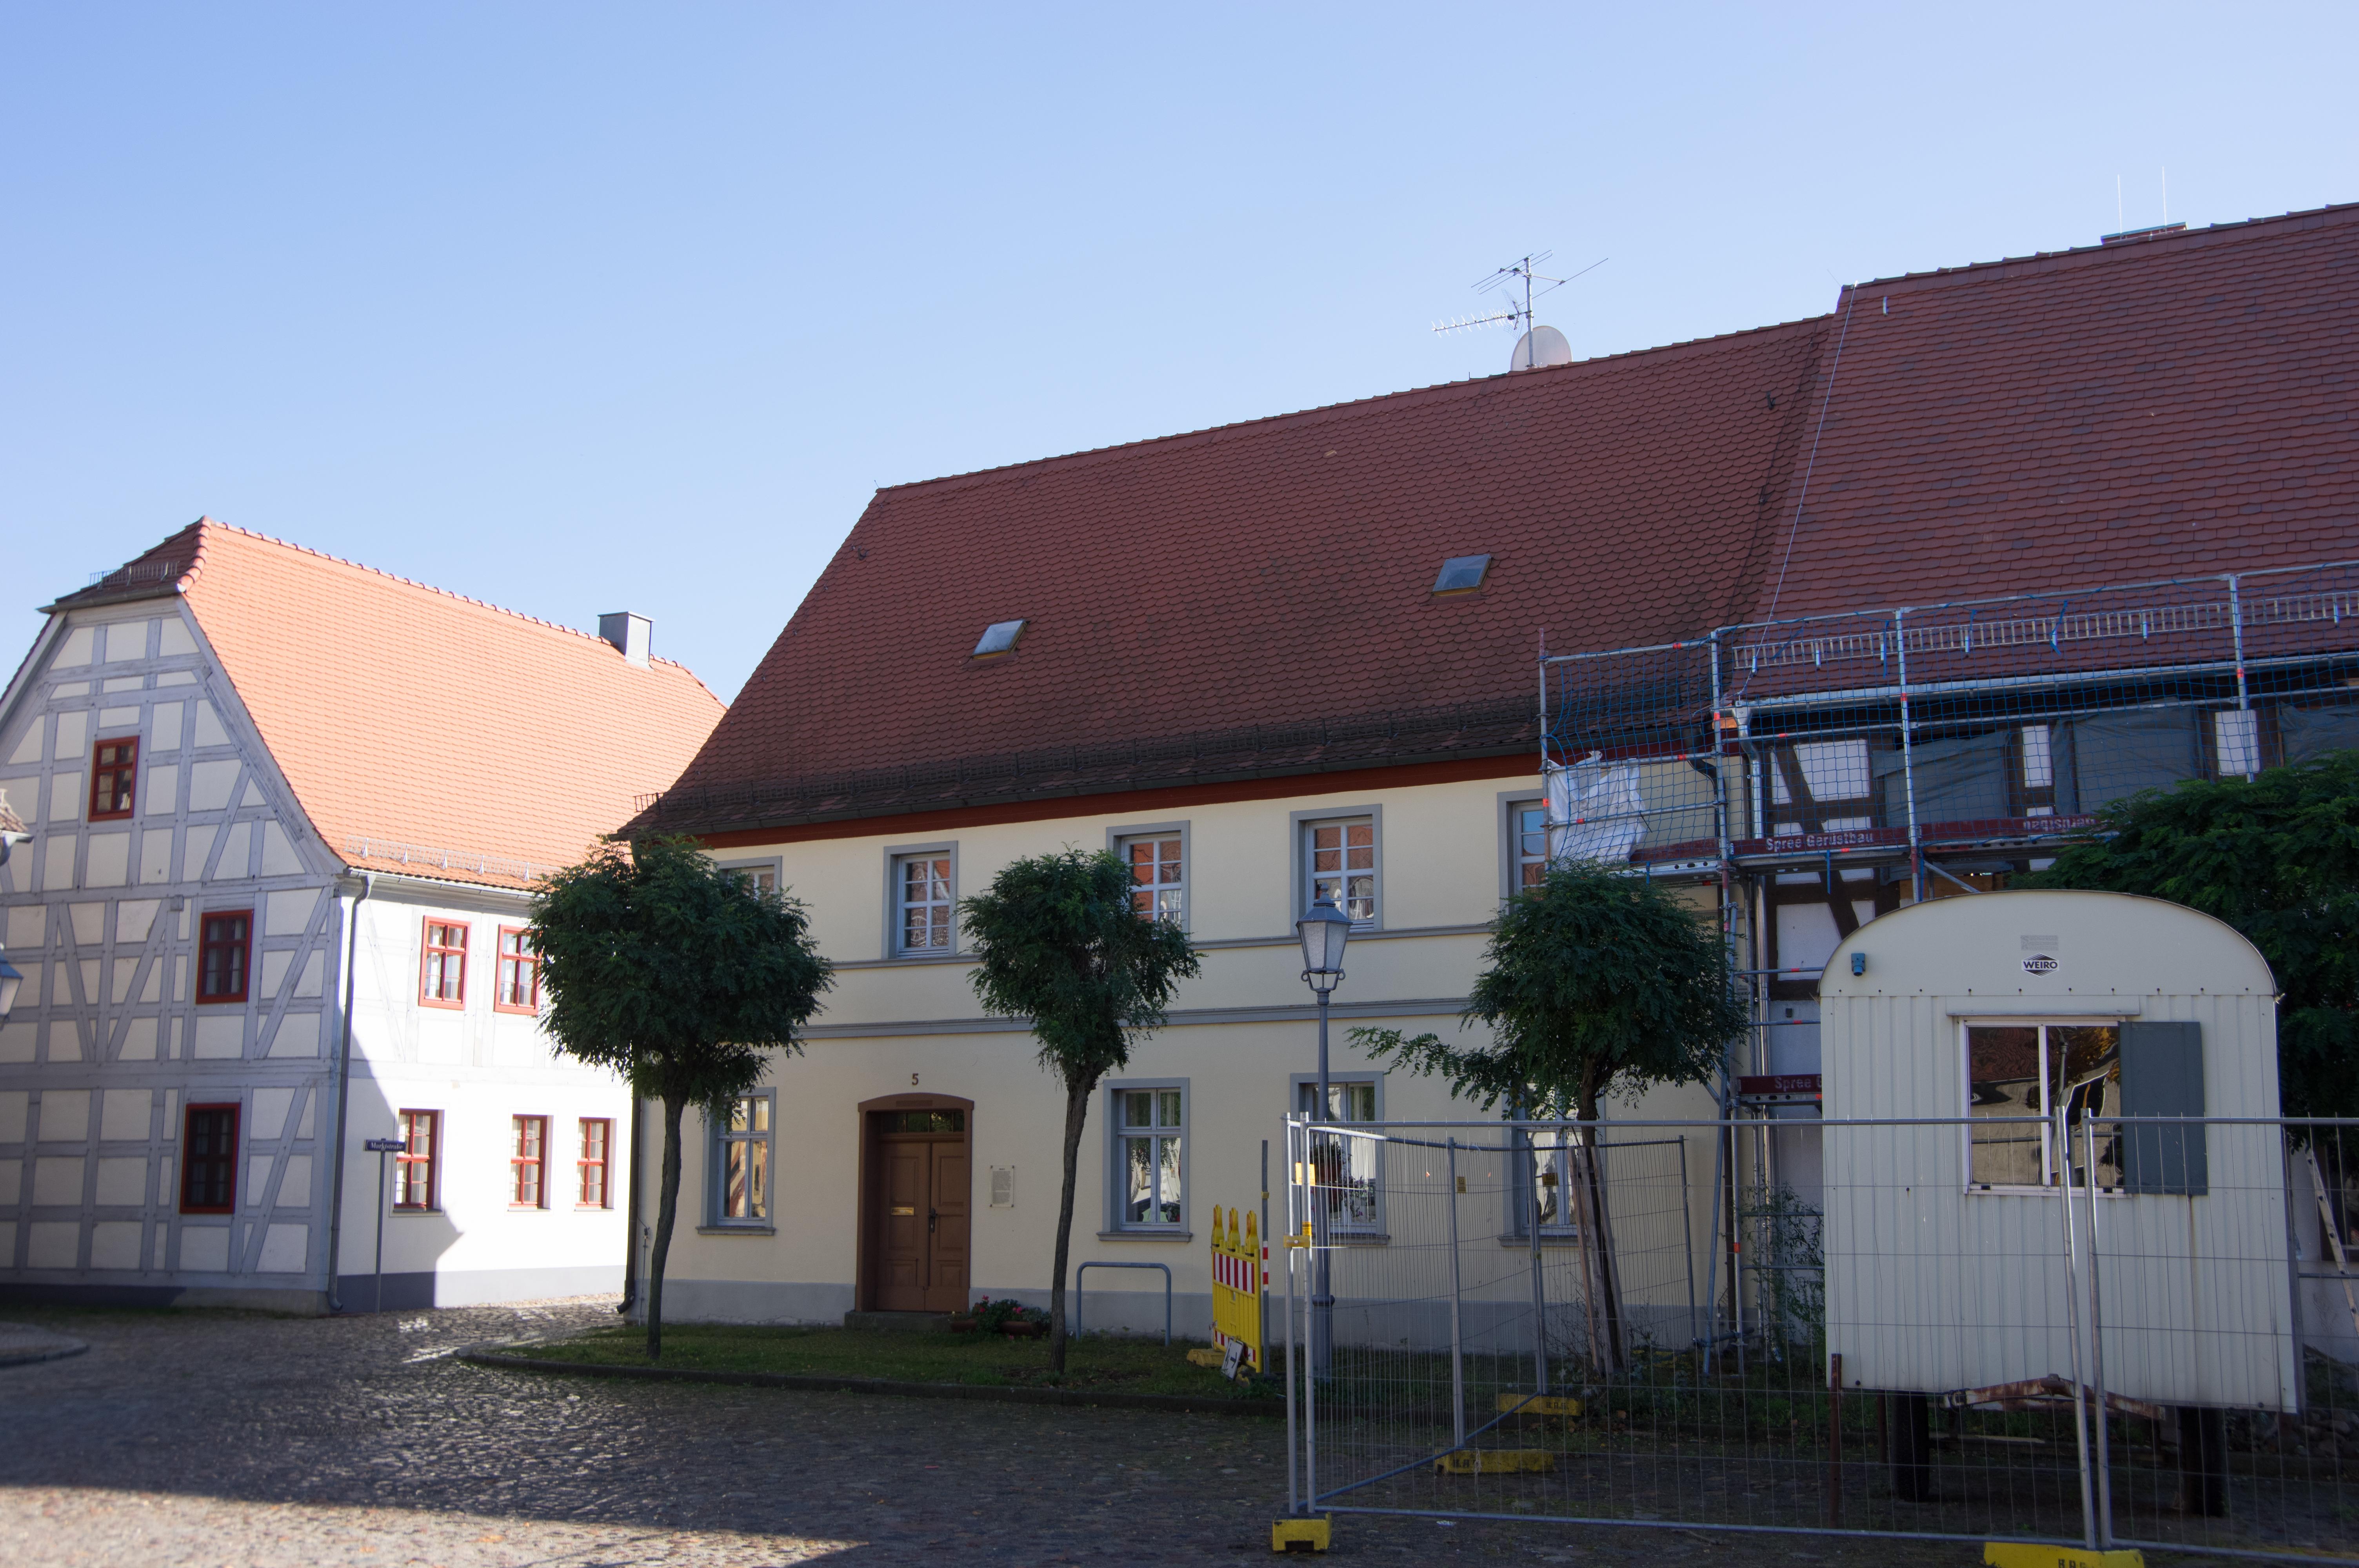 Slut aus Uebigau-Wahrenbrück